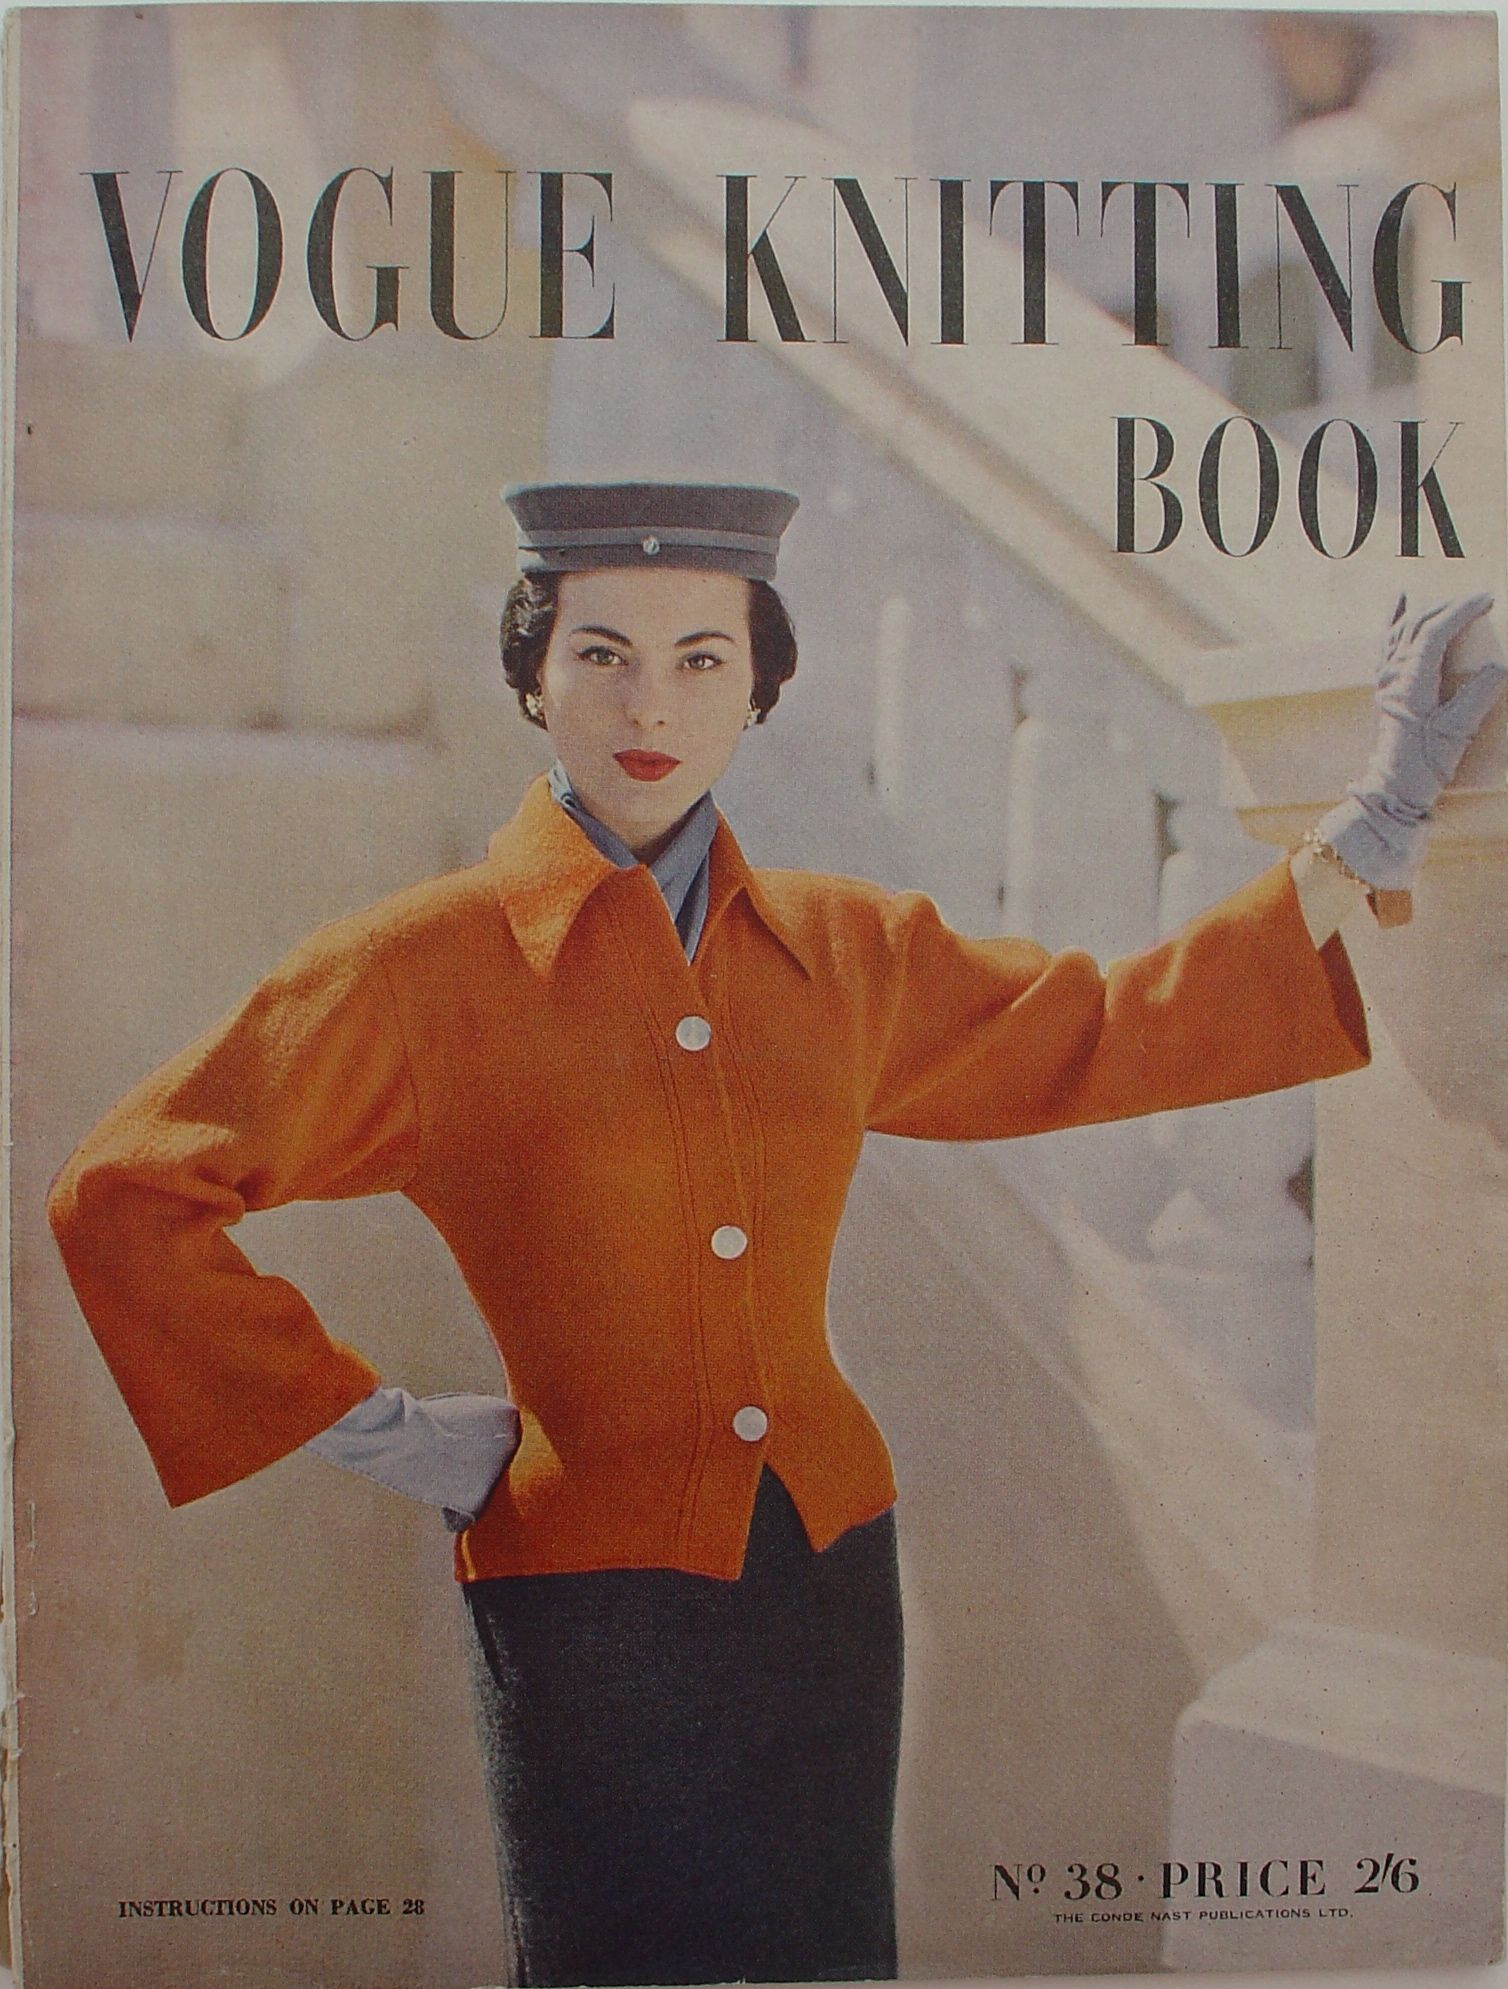 Chic 1950s Vogue pattern. | Sewing & Knitting Patterns | Pinterest ...